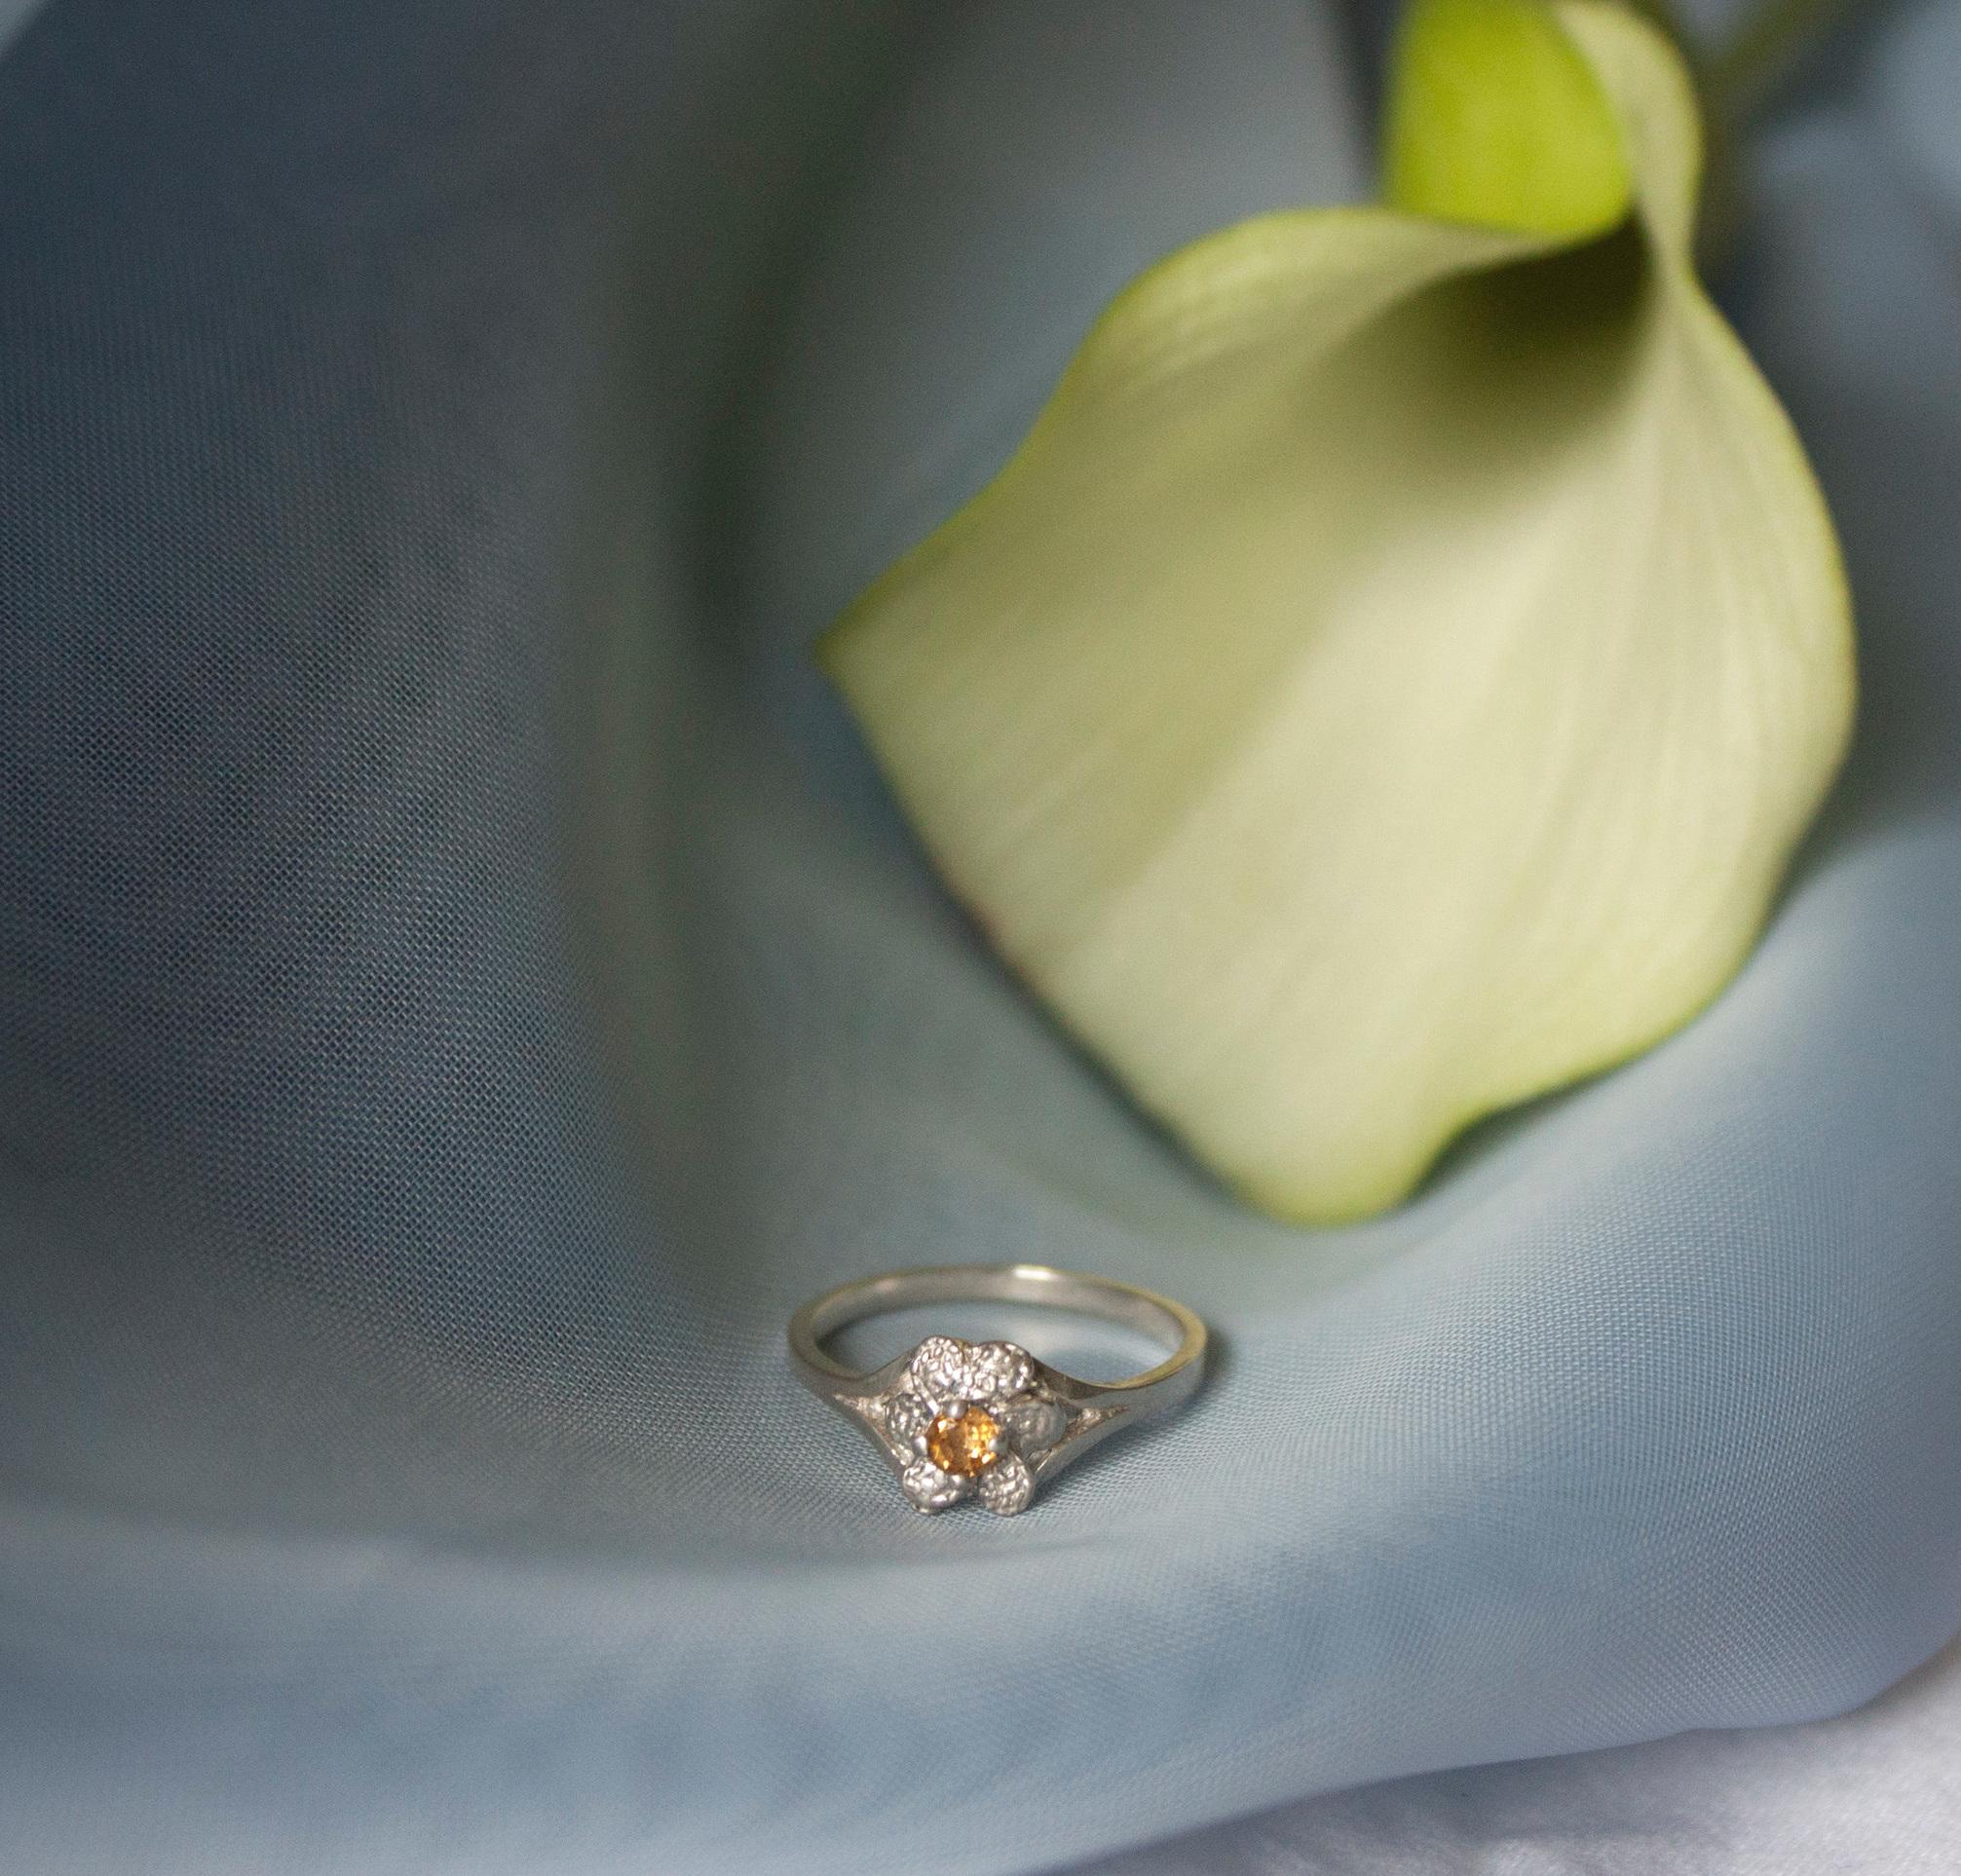 ▲ Fleur Ring